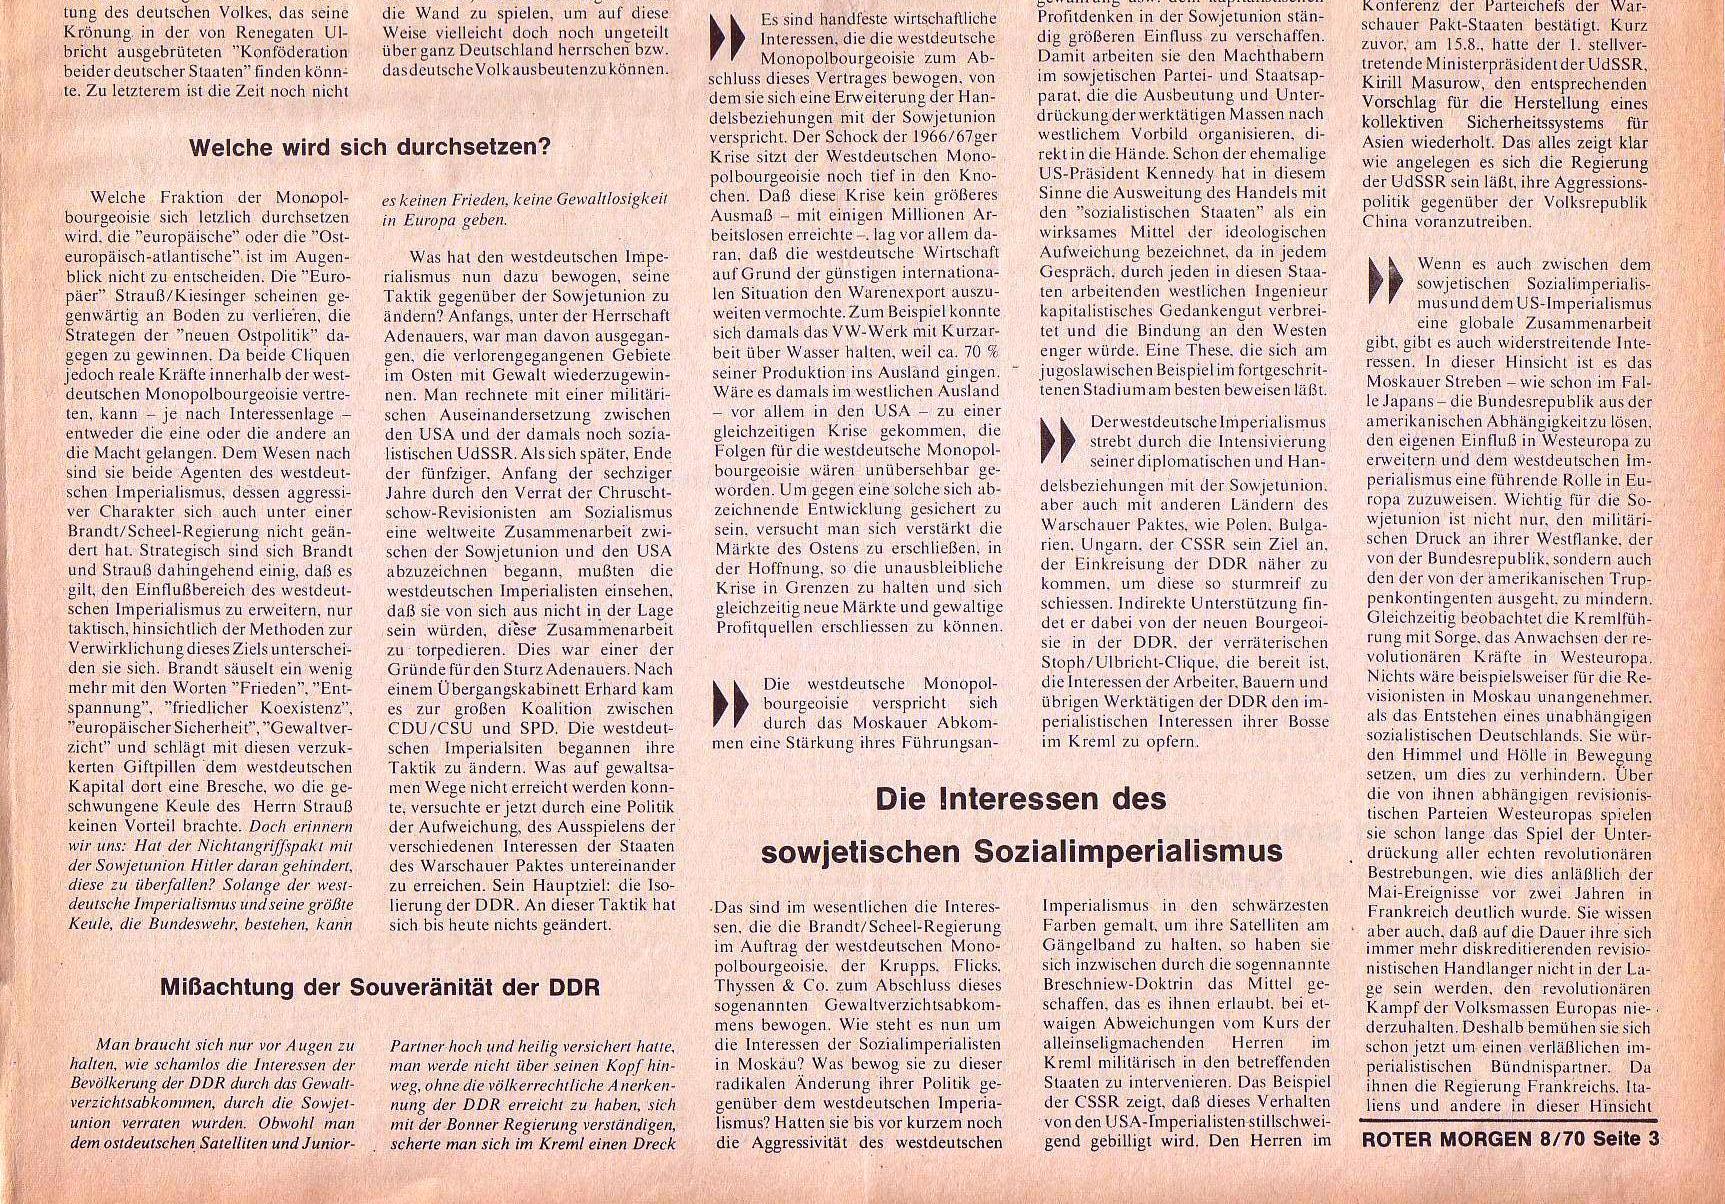 Roter Morgen, 4. Jg., September 1970, Nr. 8, Seite 3b